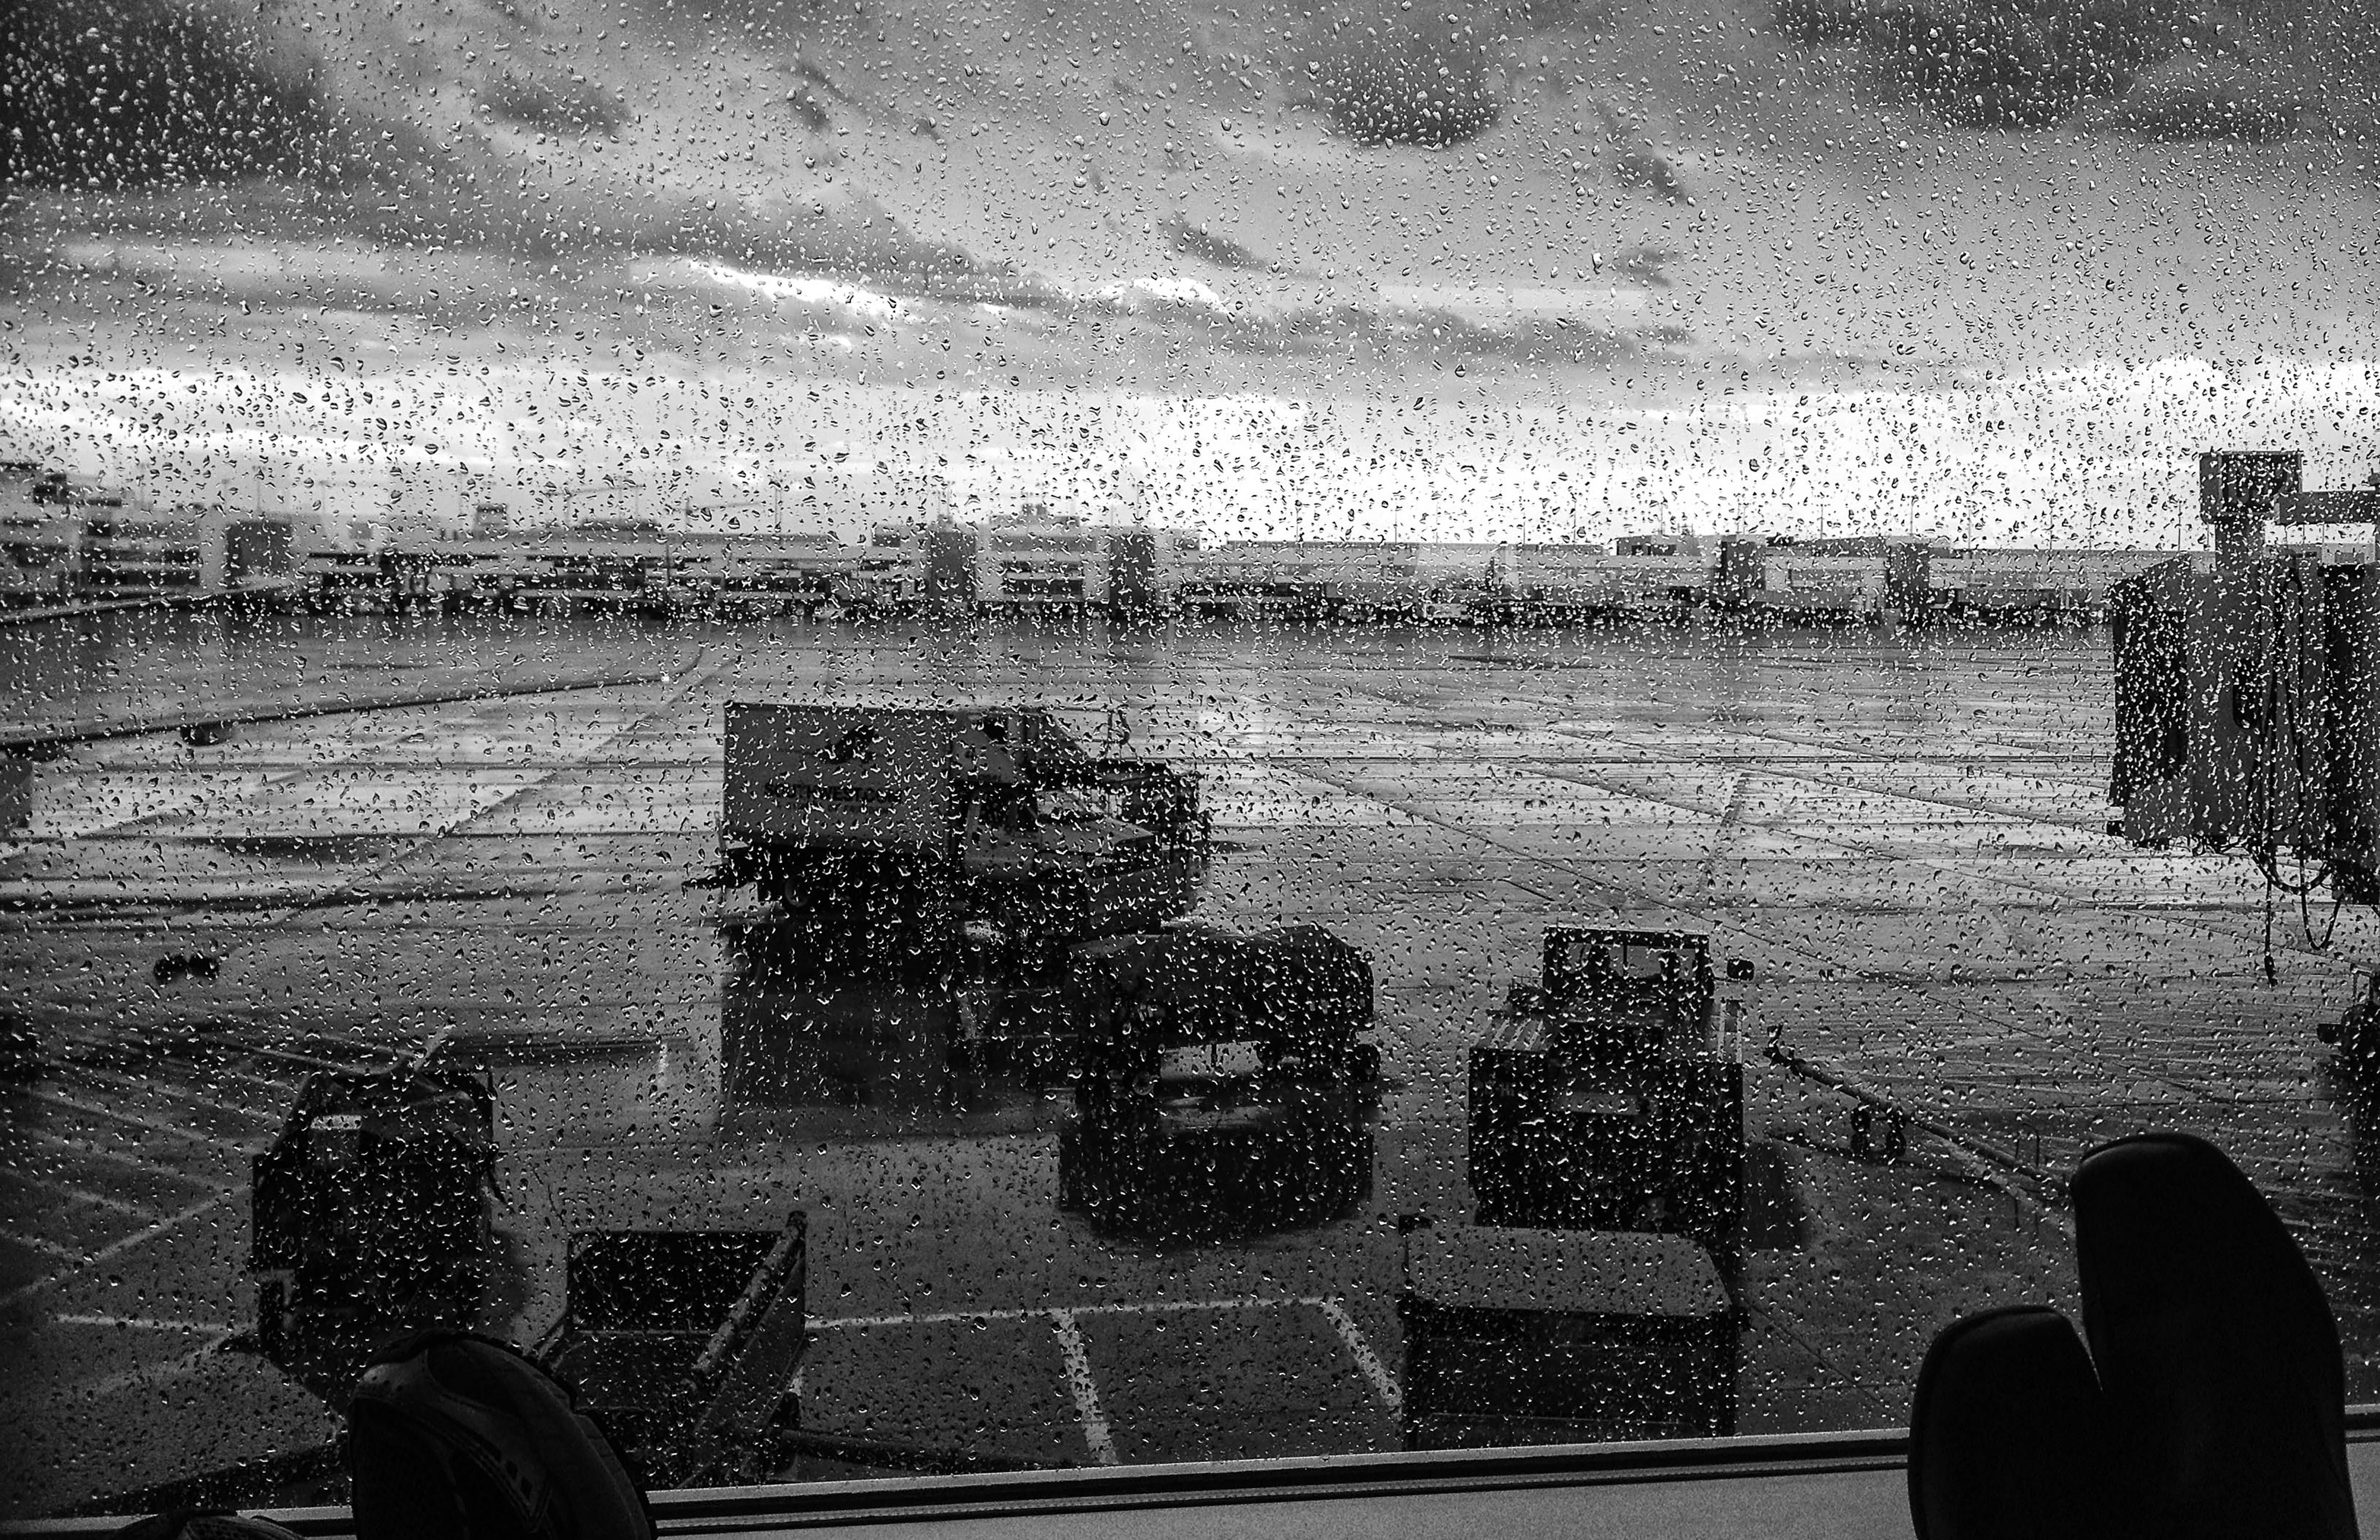 OAK_airport_rain_©_2014_SMD-print_11x17